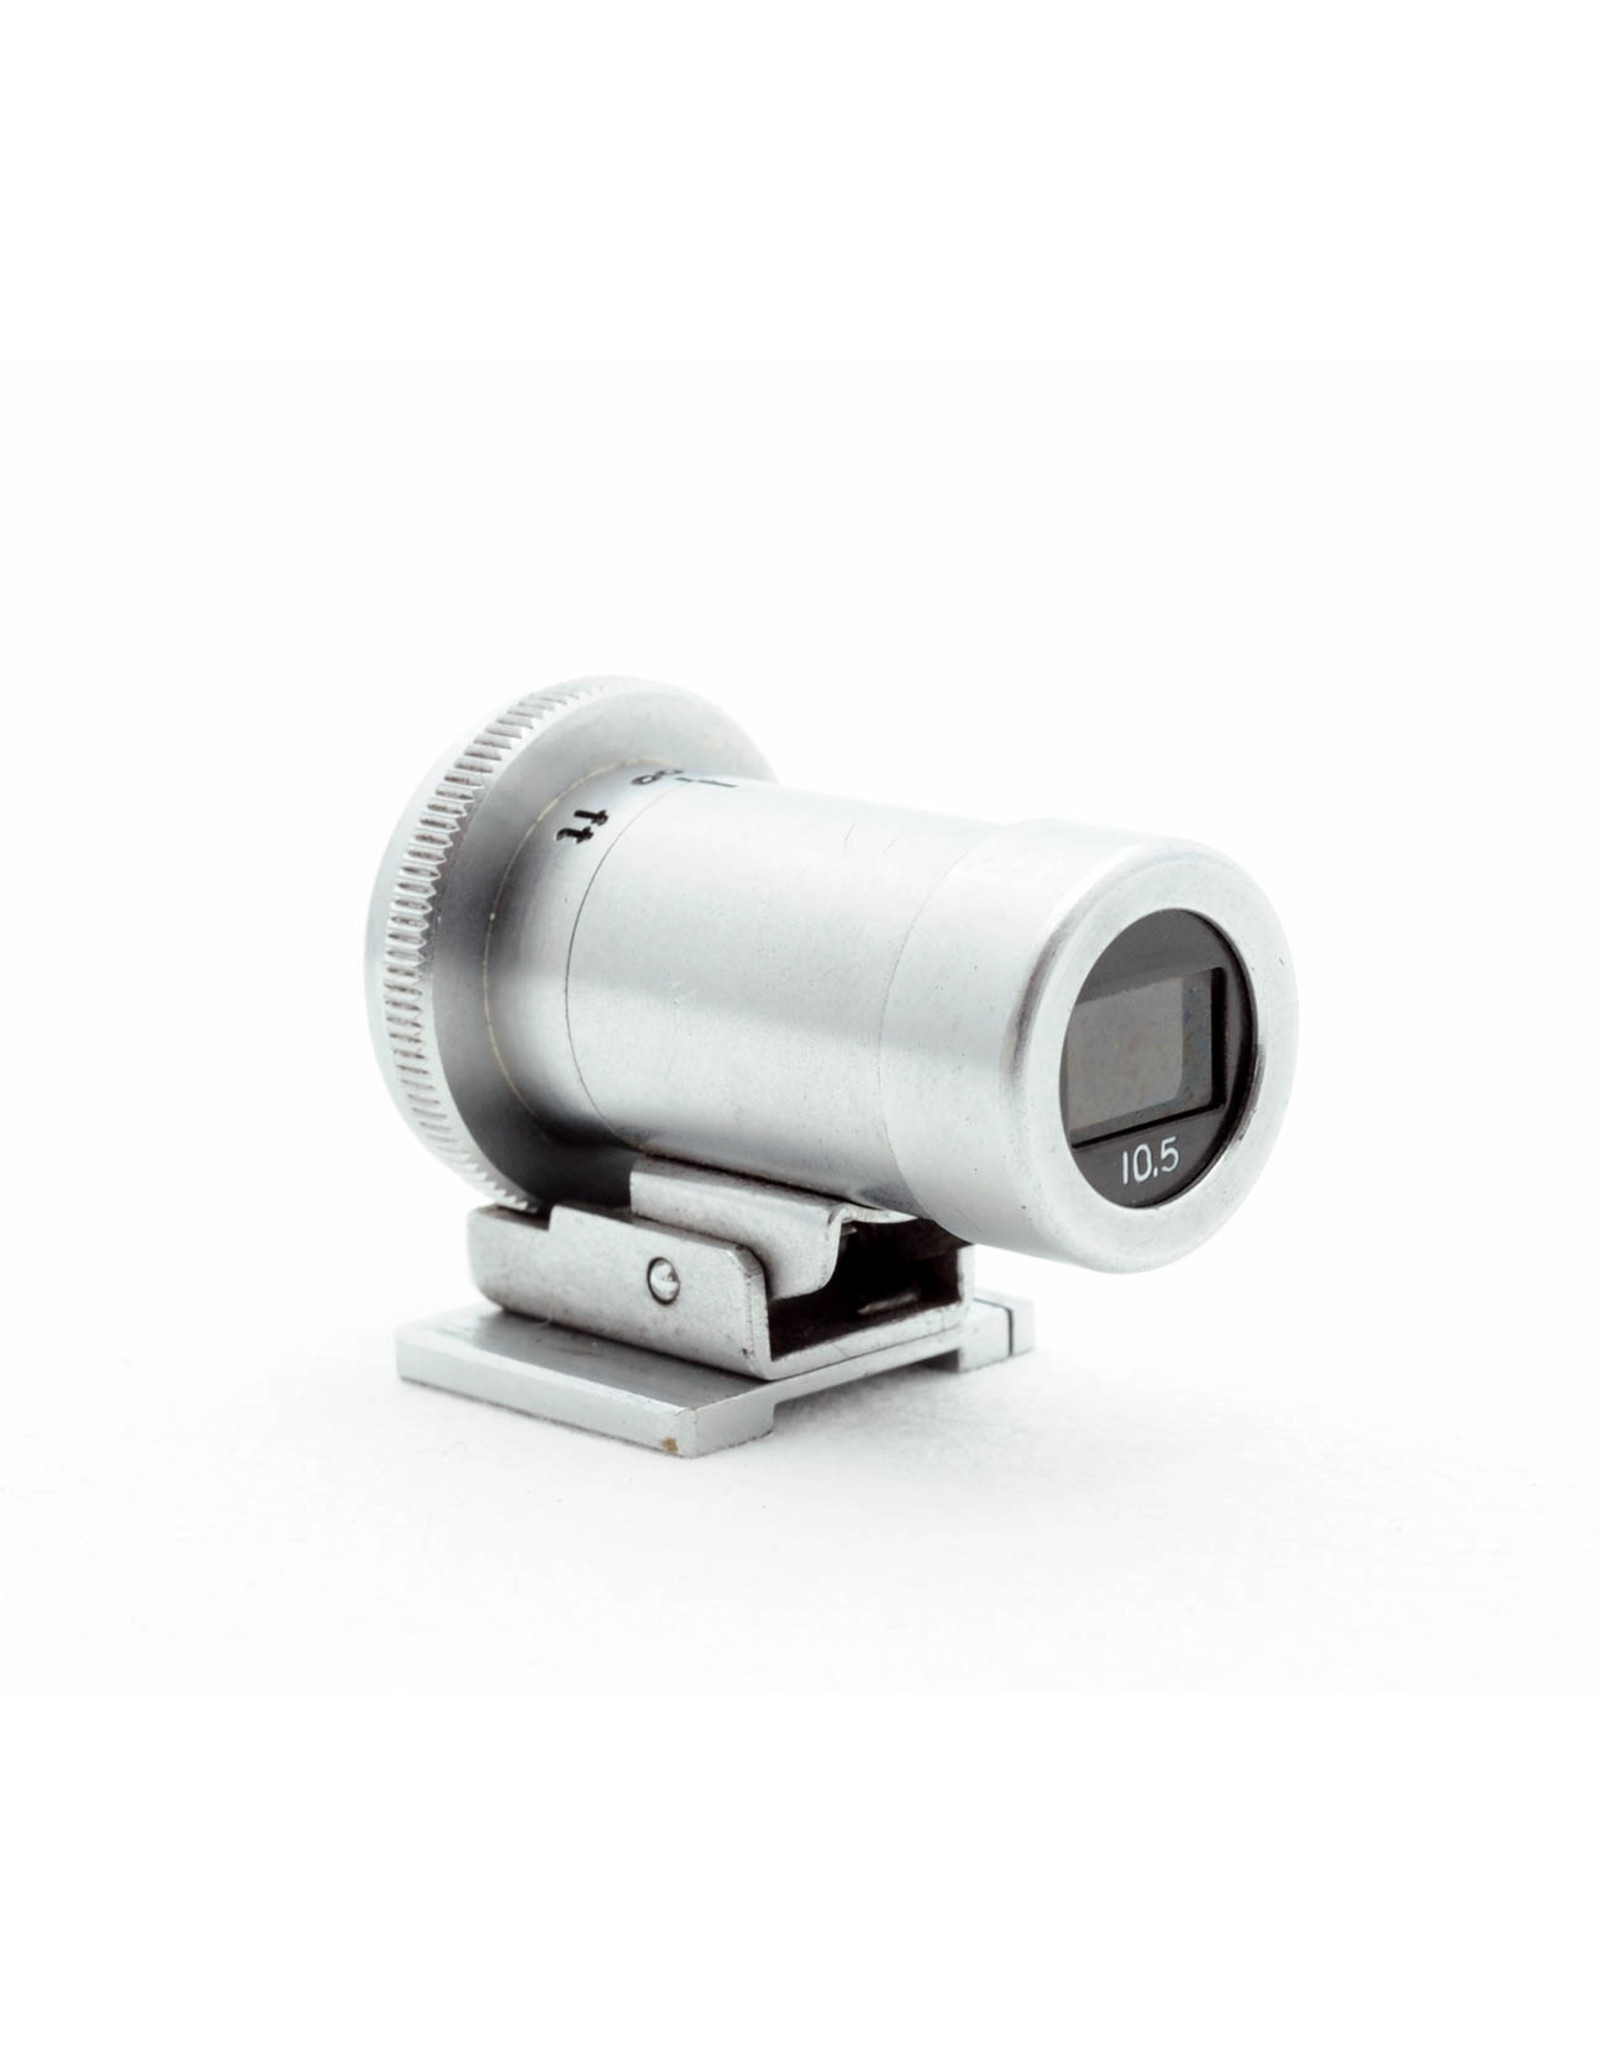 Nikon Nikon 10.5cm f2.5 Nikkor-P.C L39 with View finder   AP2103005